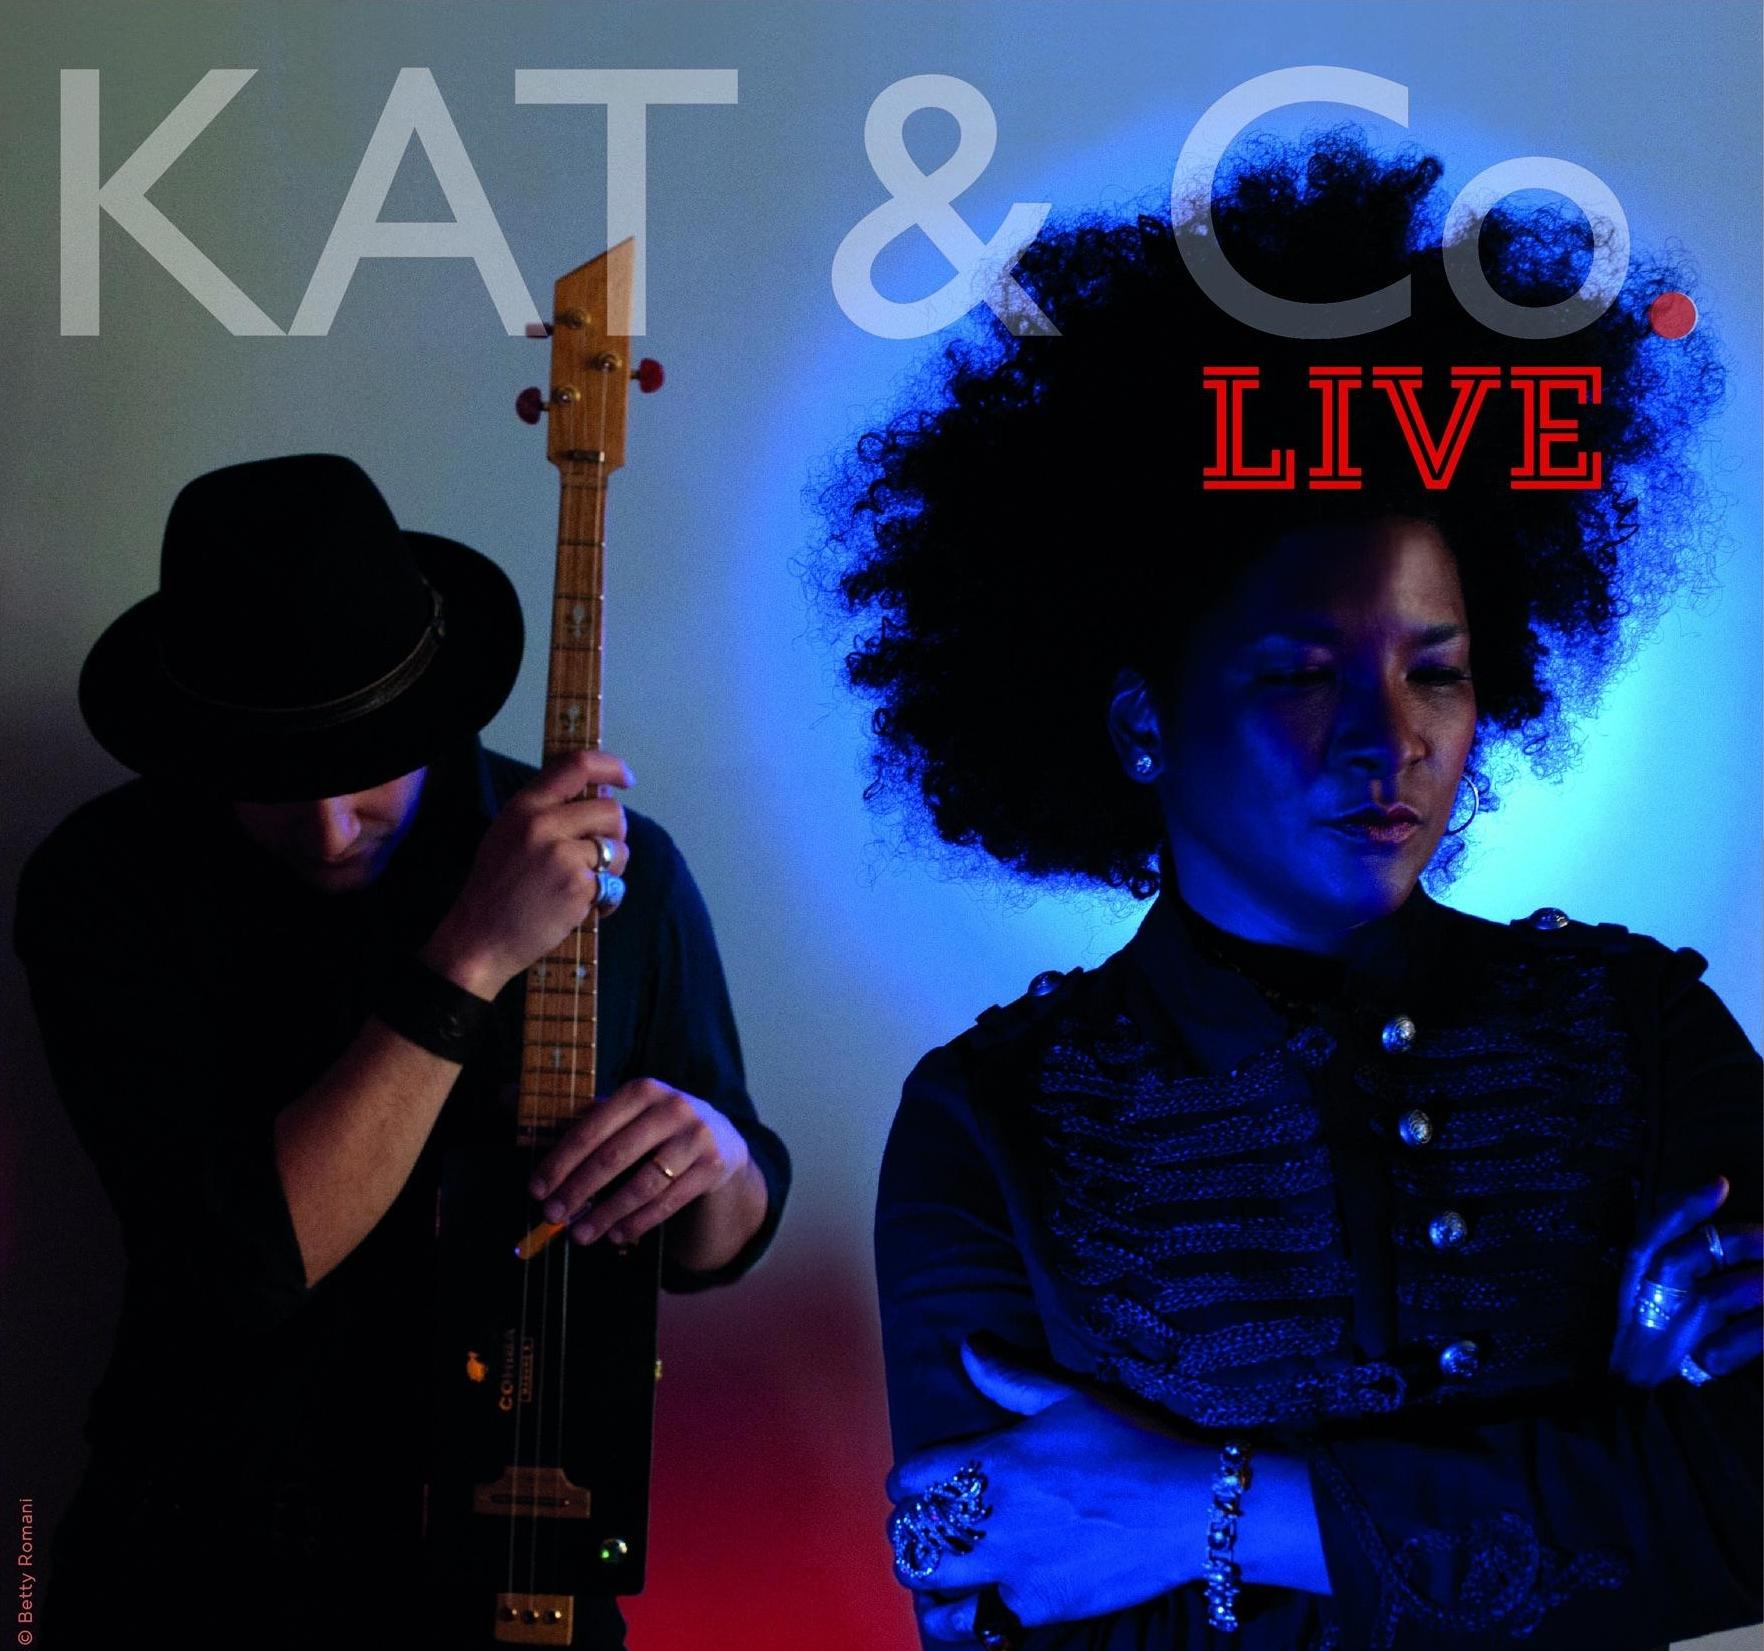 Kat&Co LIVE.jpg